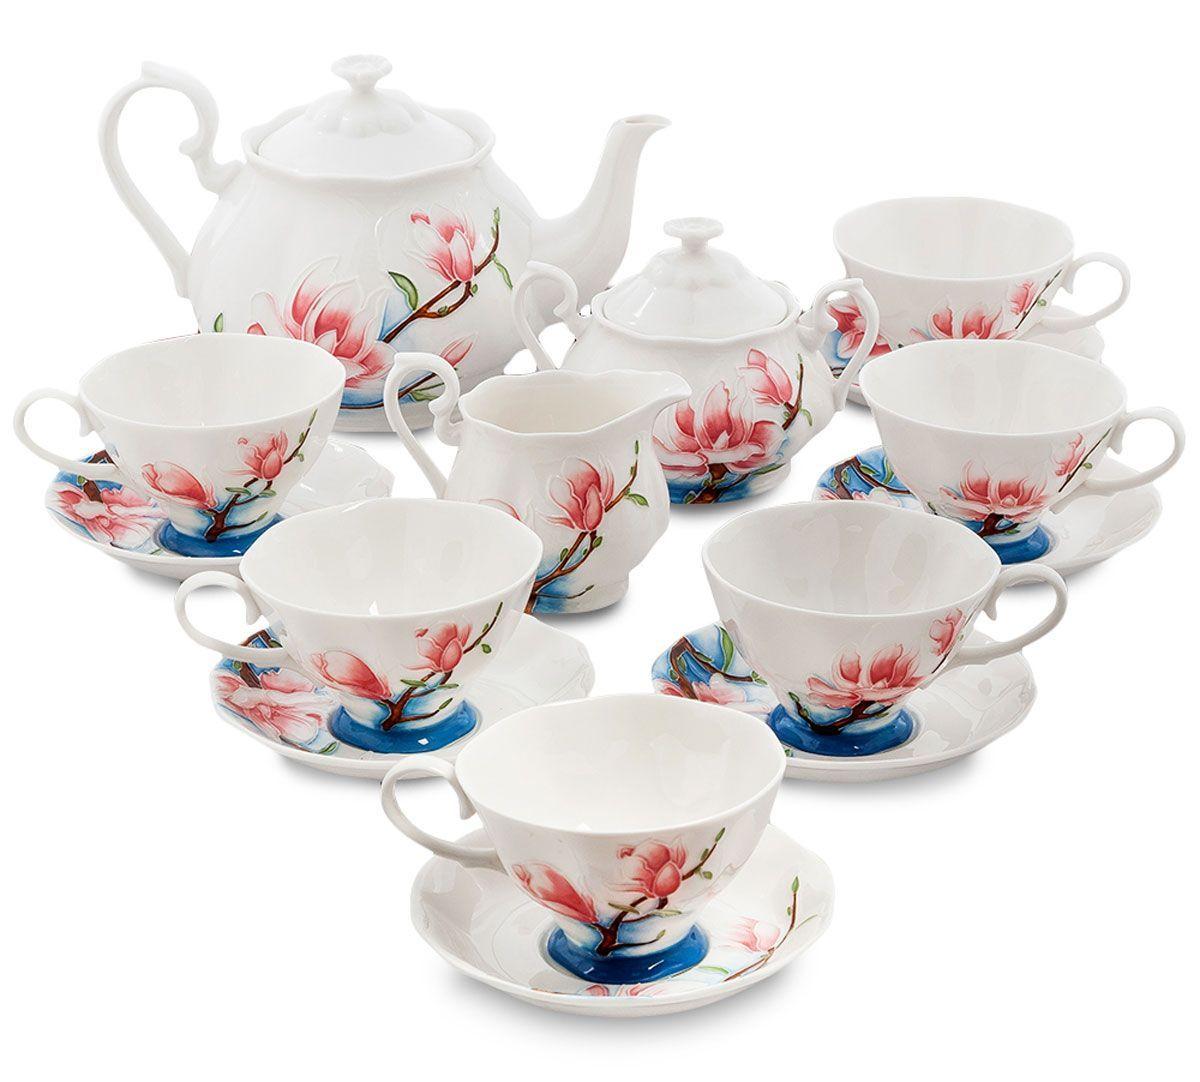 Сервиз чайный Pavone Цветущая сакура, 15 предметов. 451572451572Объем чайника: 1,25 лОбъем сахарницы: 400 мл Объем молочника: 250 мл Объем чашки: 200 млДиаметр блюдца: 14 см.